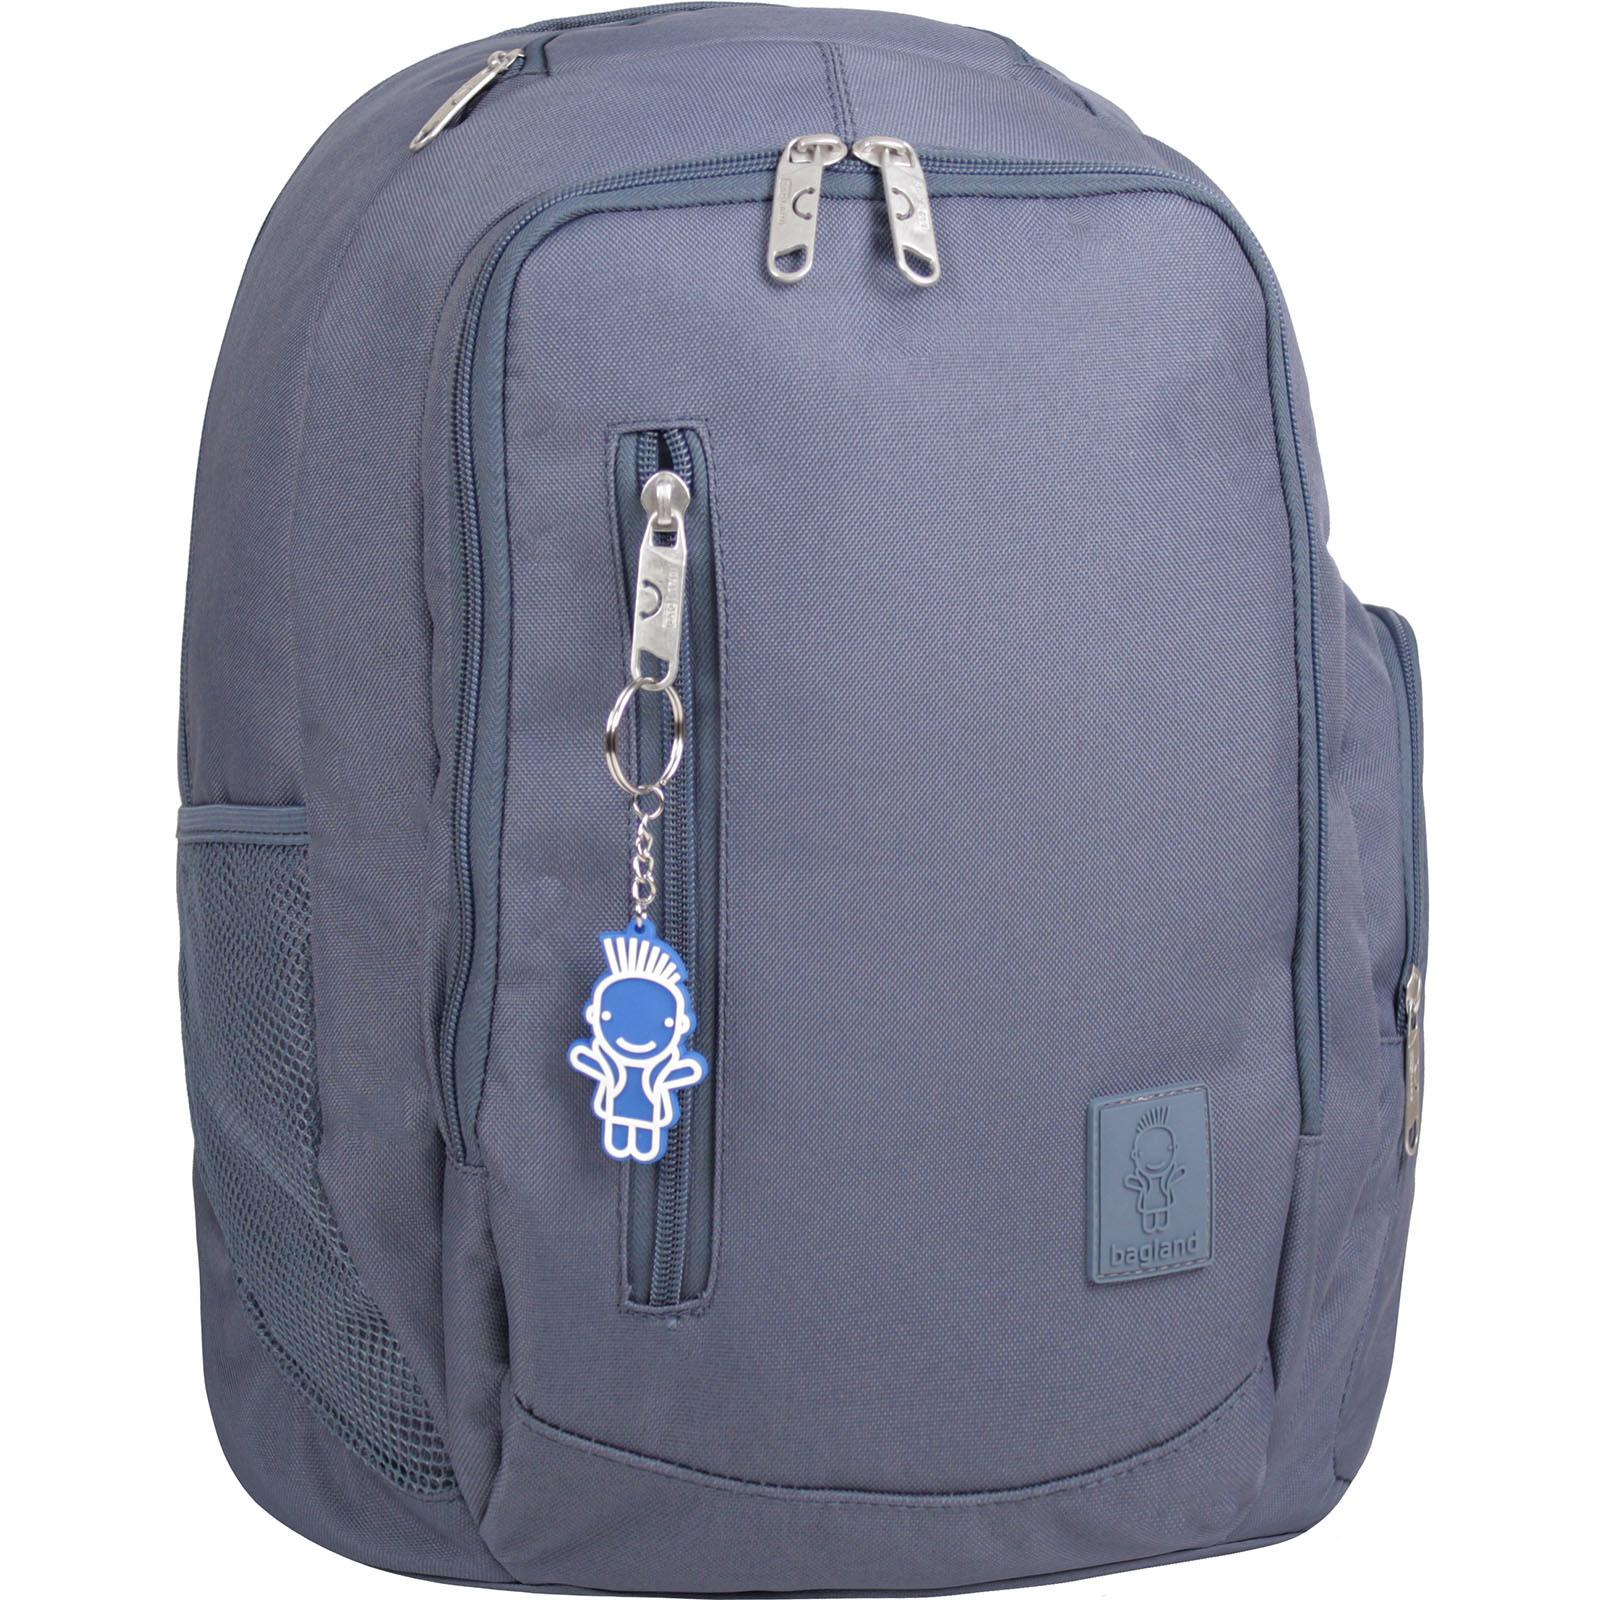 Рюкзаки для ноутбука Рюкзак для ноутбука Bagland Техас 29 л. Темно серый (00532662) IMG_1618.JPG